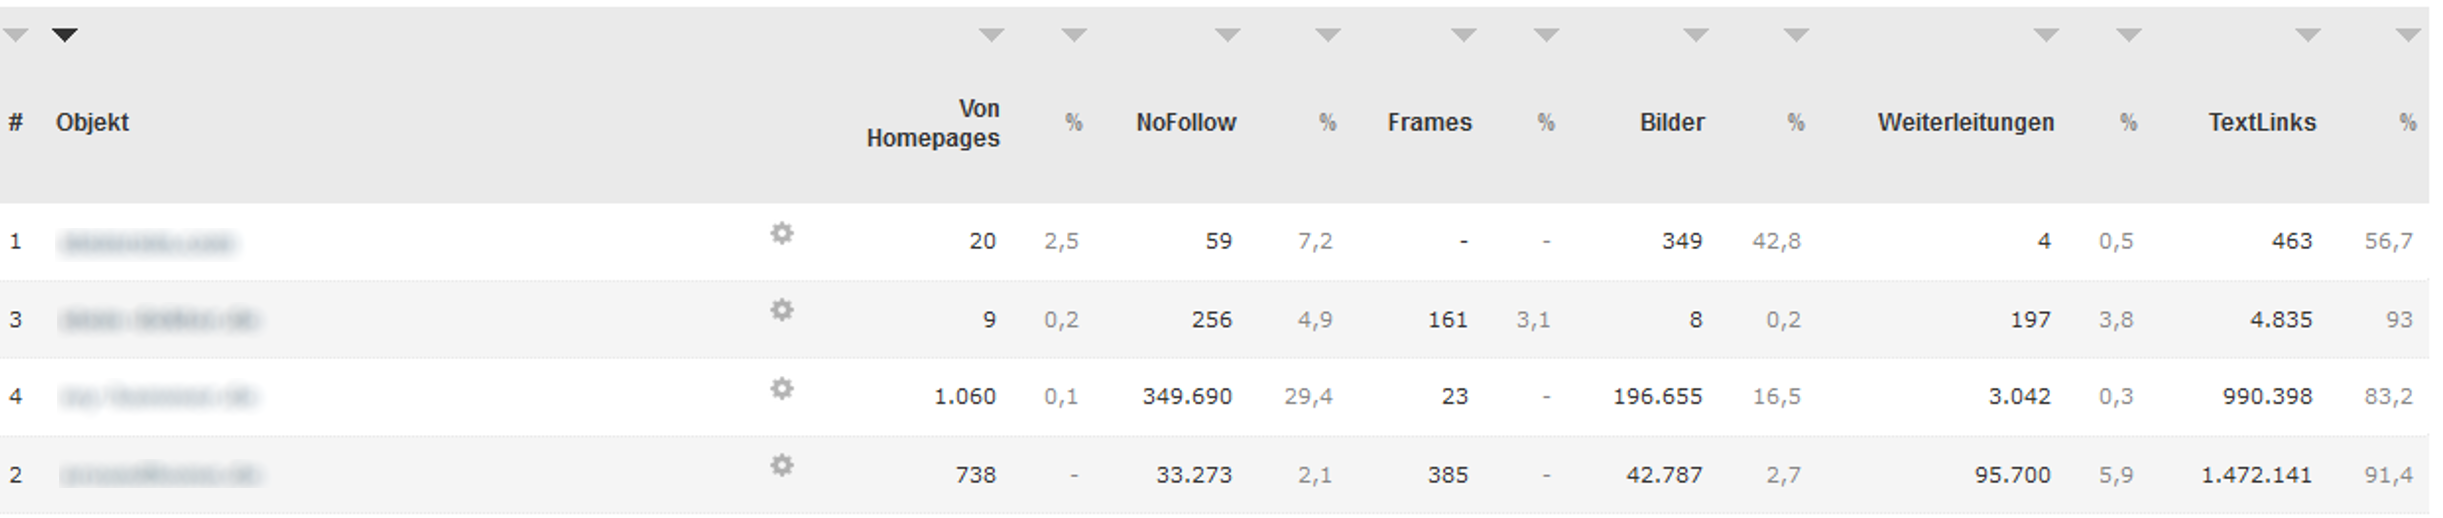 Linkbuilding Linkprofil Vergleich